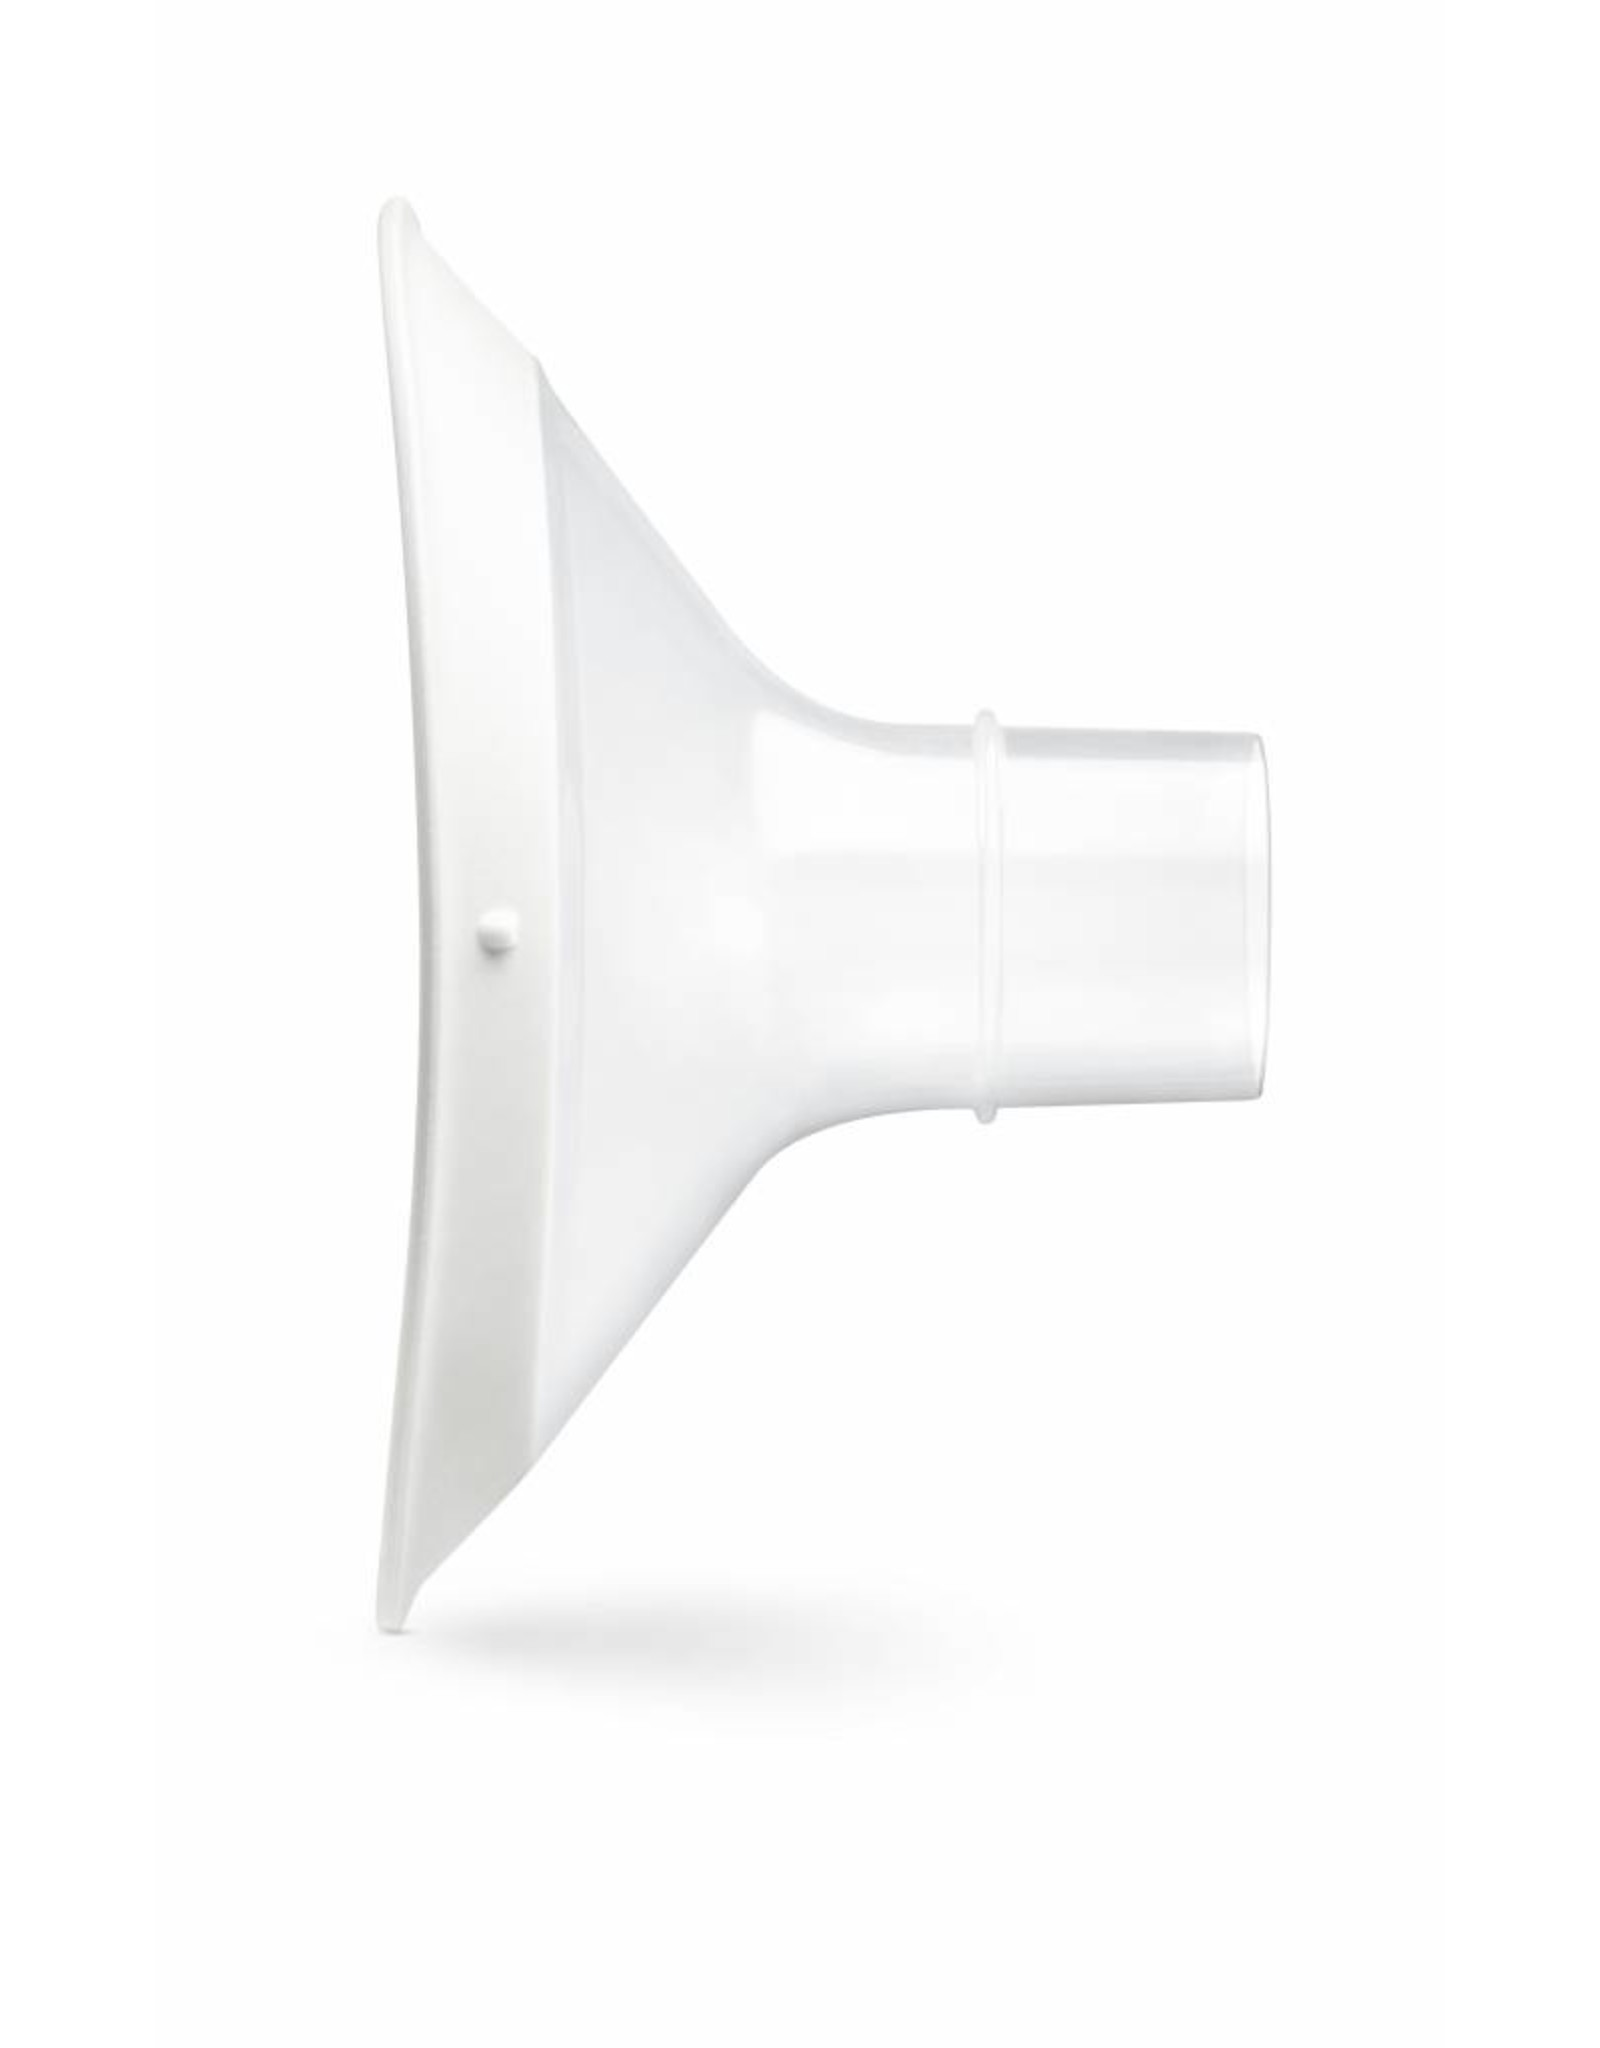 Medela Medela PersonalFit Flex, 2 Brusthauben Grösse S (21mm)